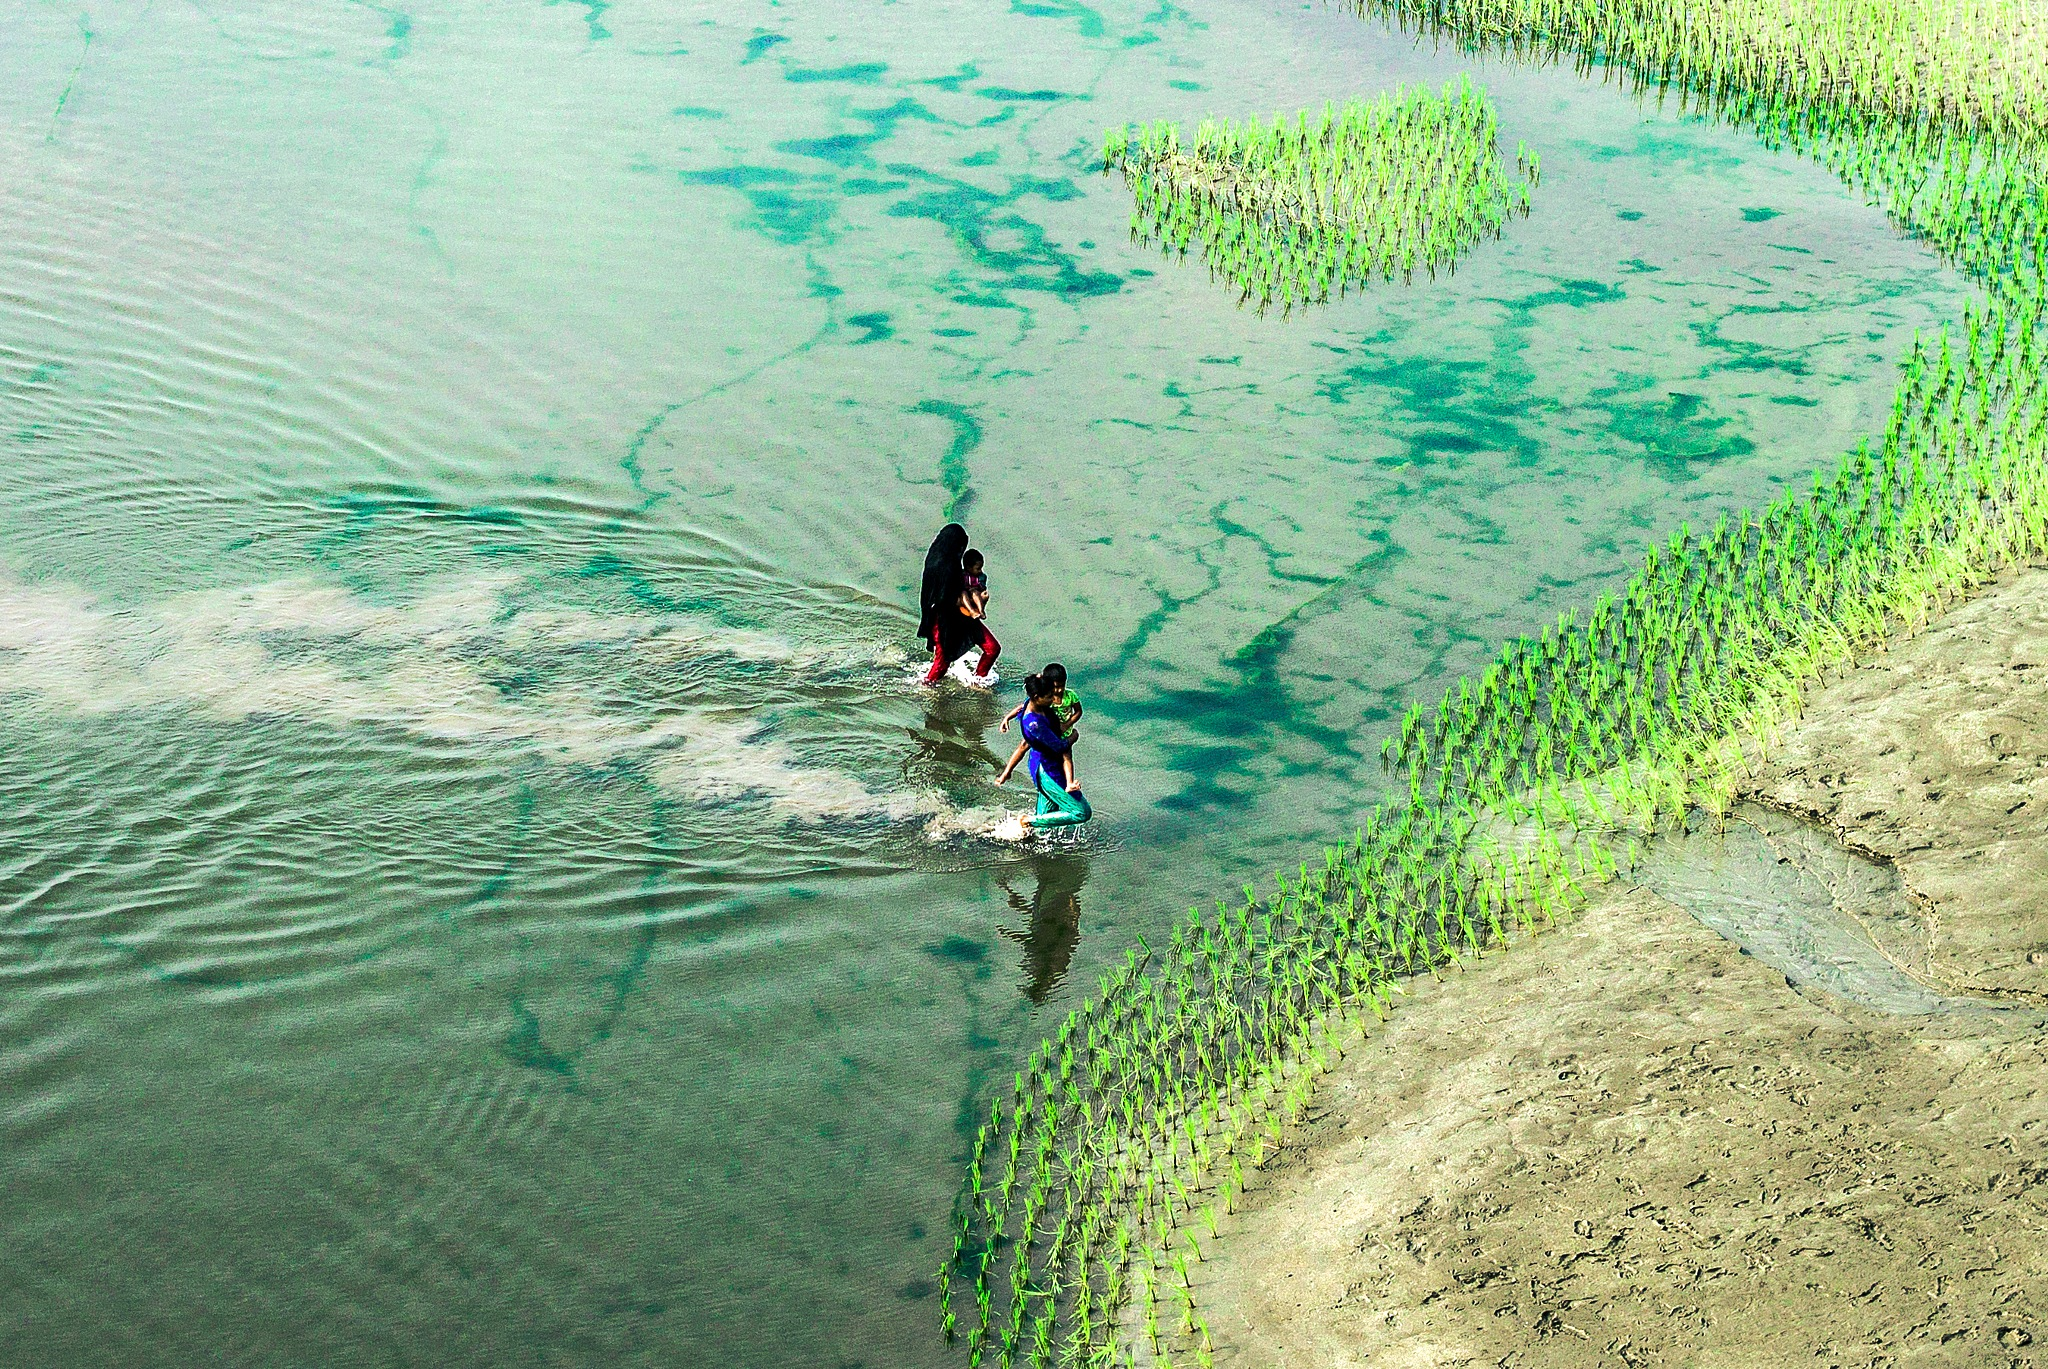 Women of riverside by Ehsanul Siddiq Aranya